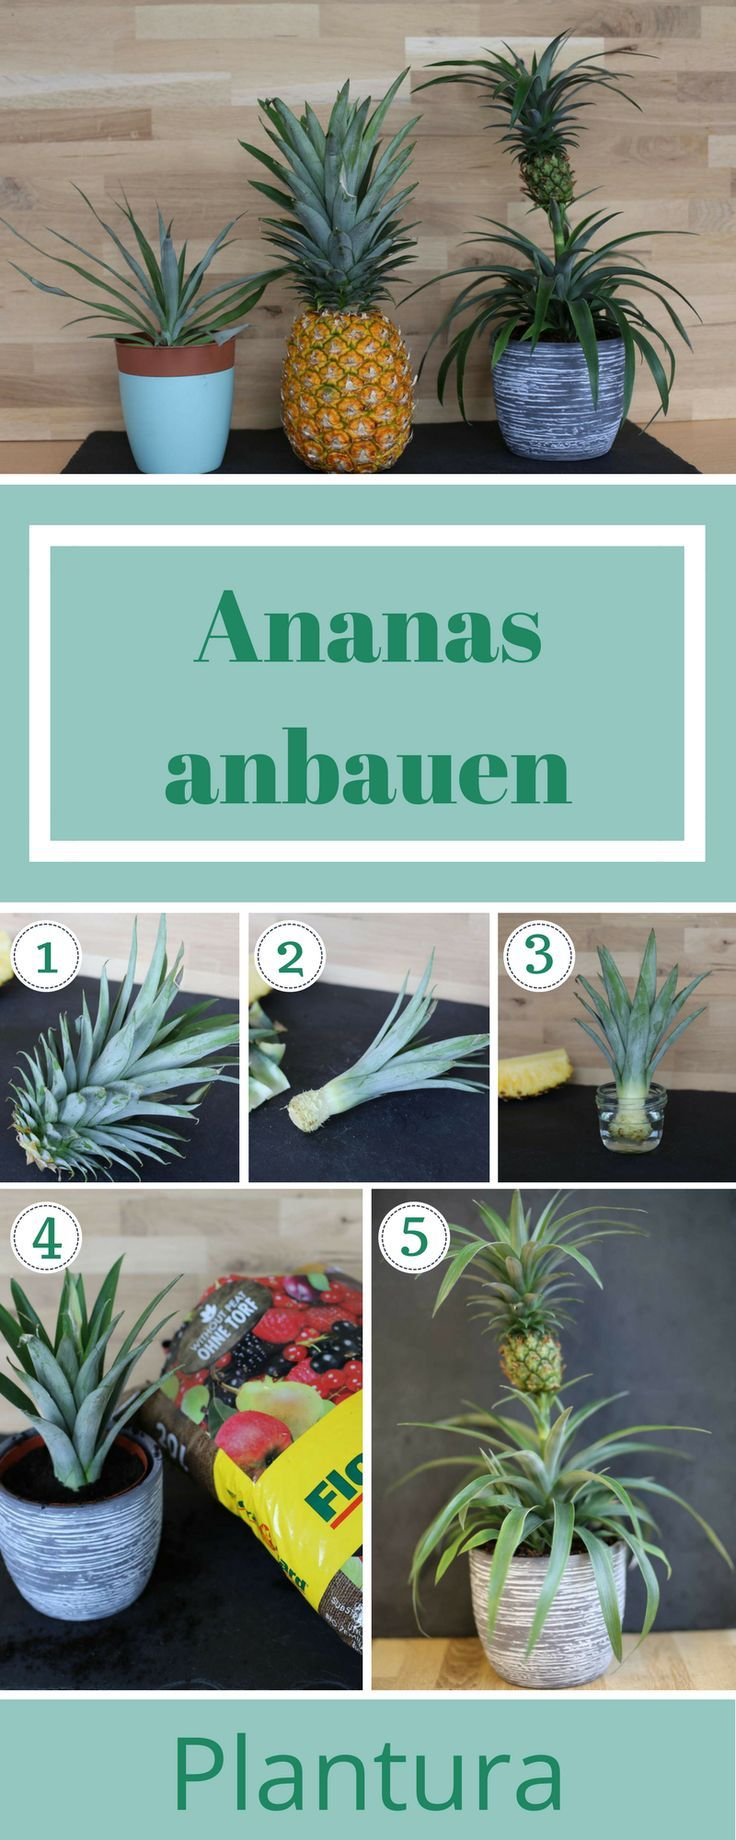 Ananas anpflanzen: Vermehrung & Anbau (Anleitung)